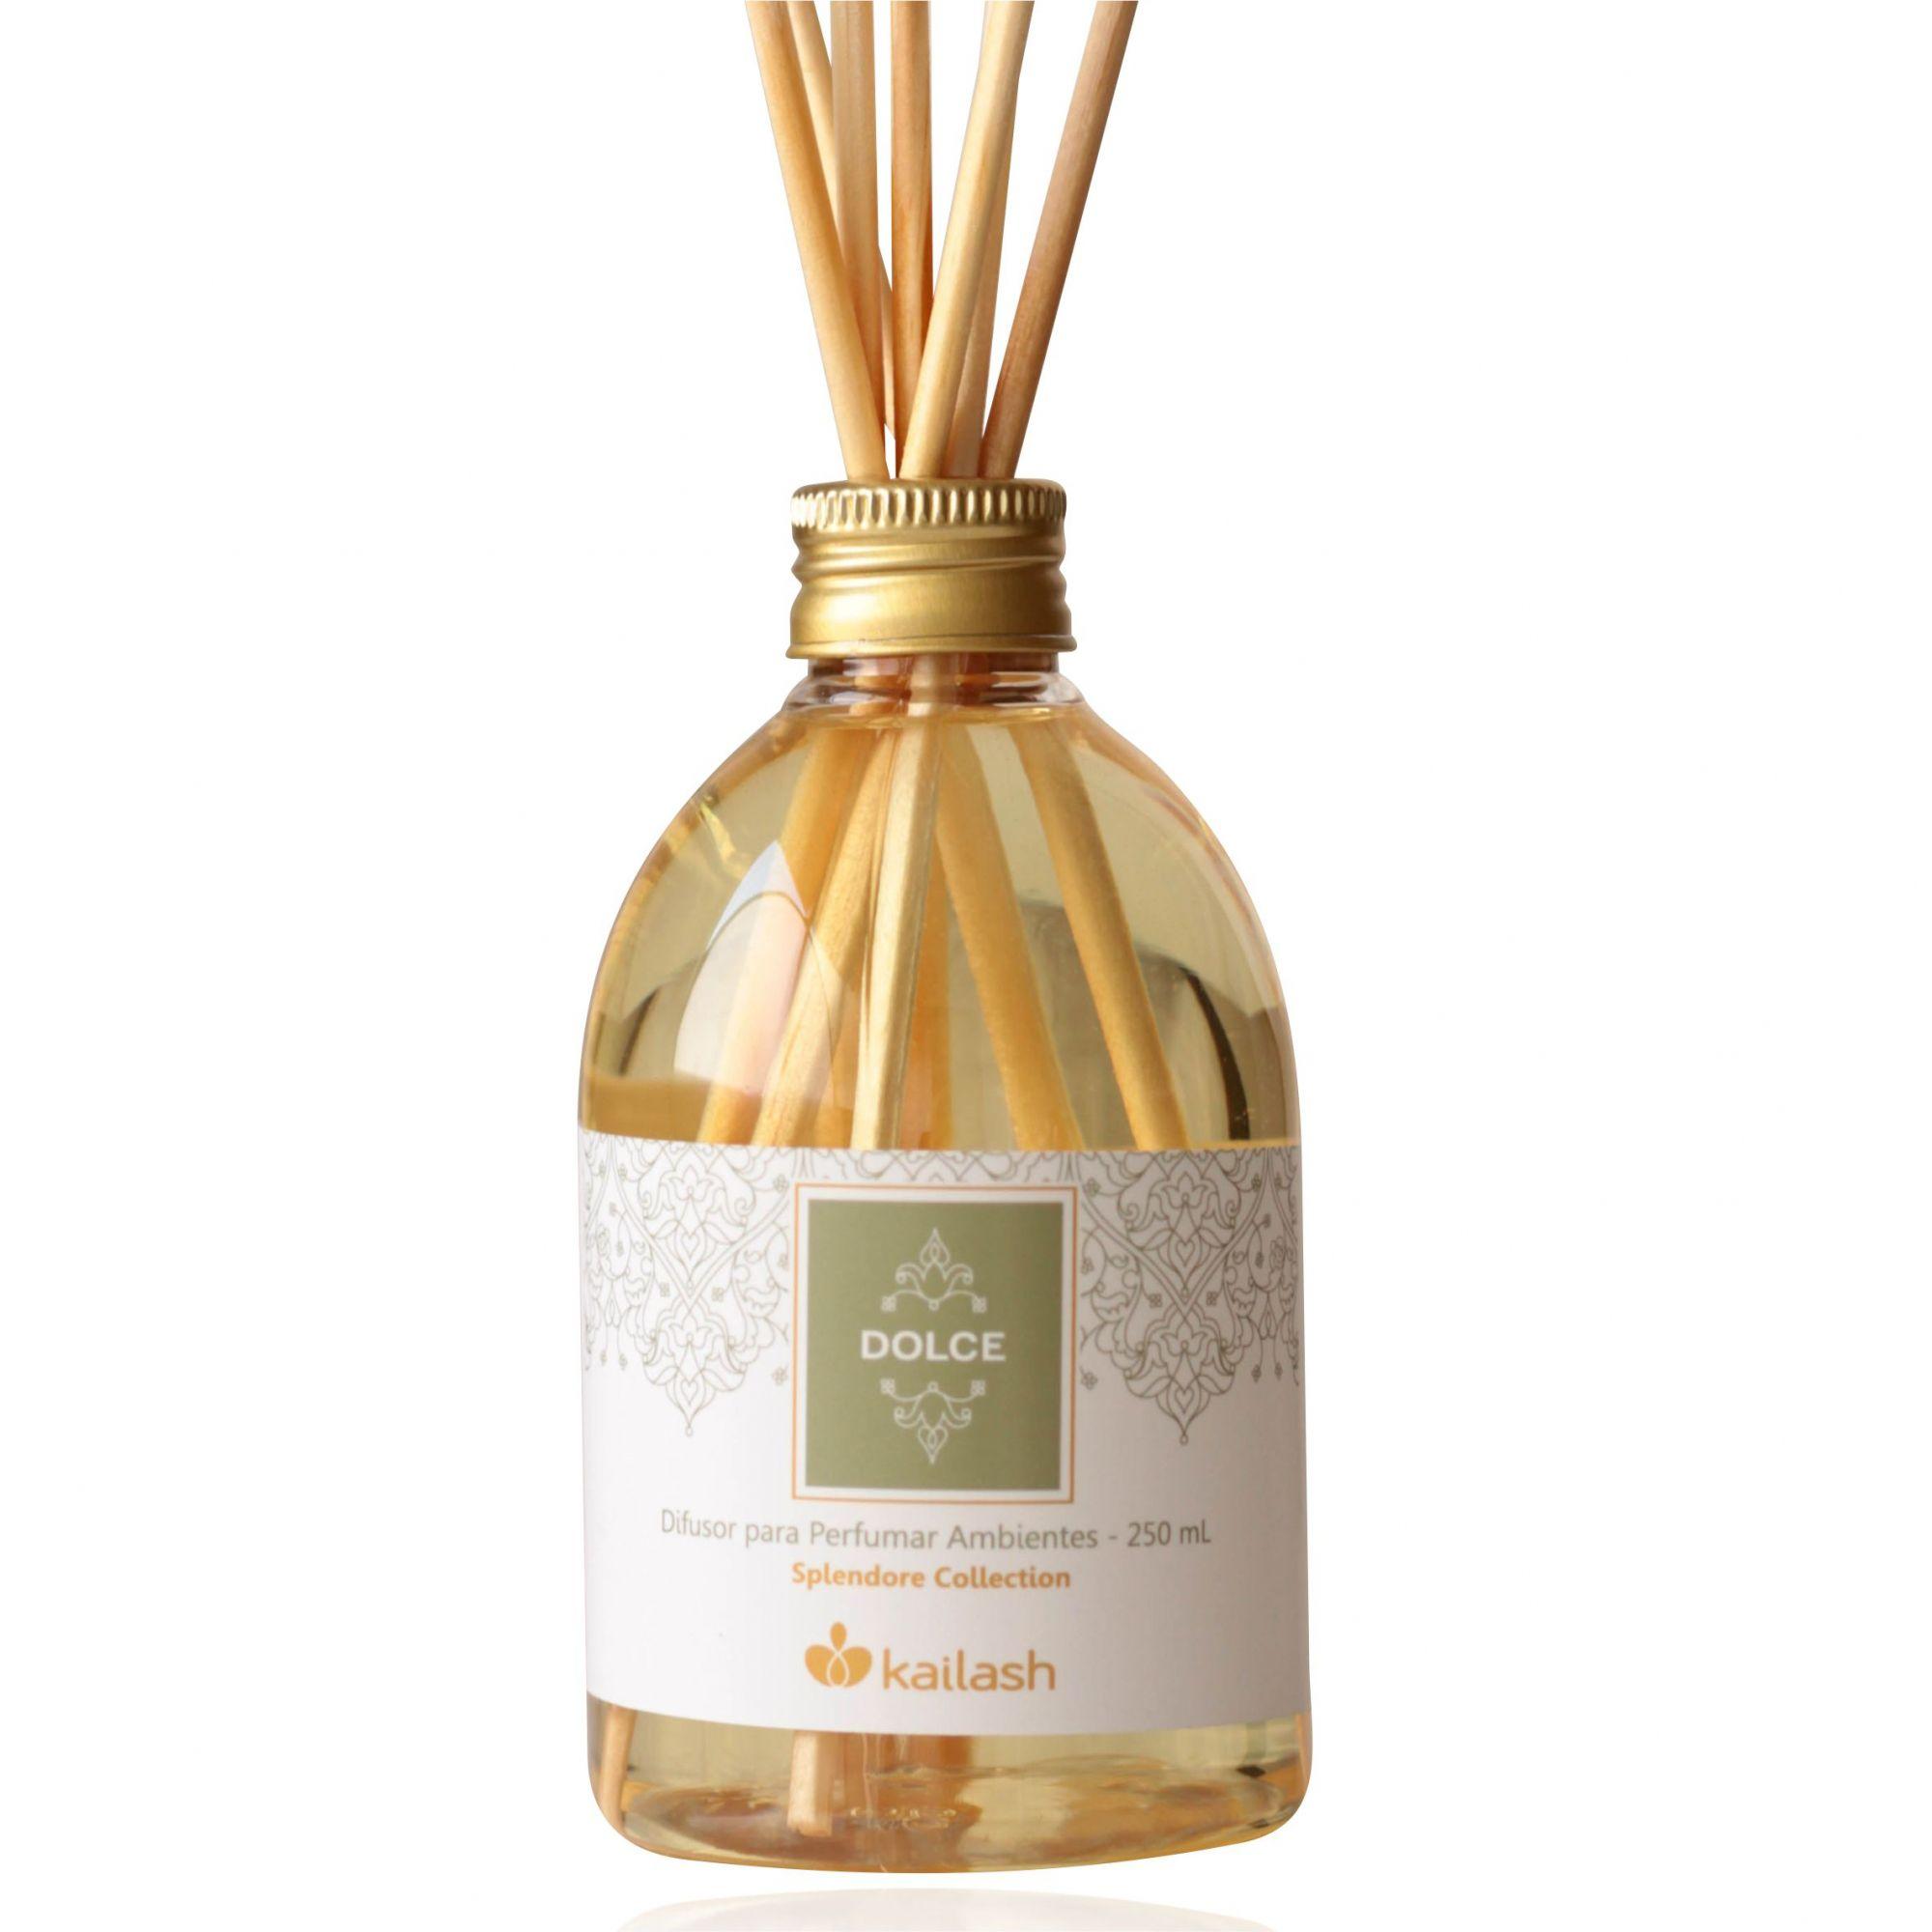 Difusor Econômico de Perfume para Ambientes Dolce 200mL